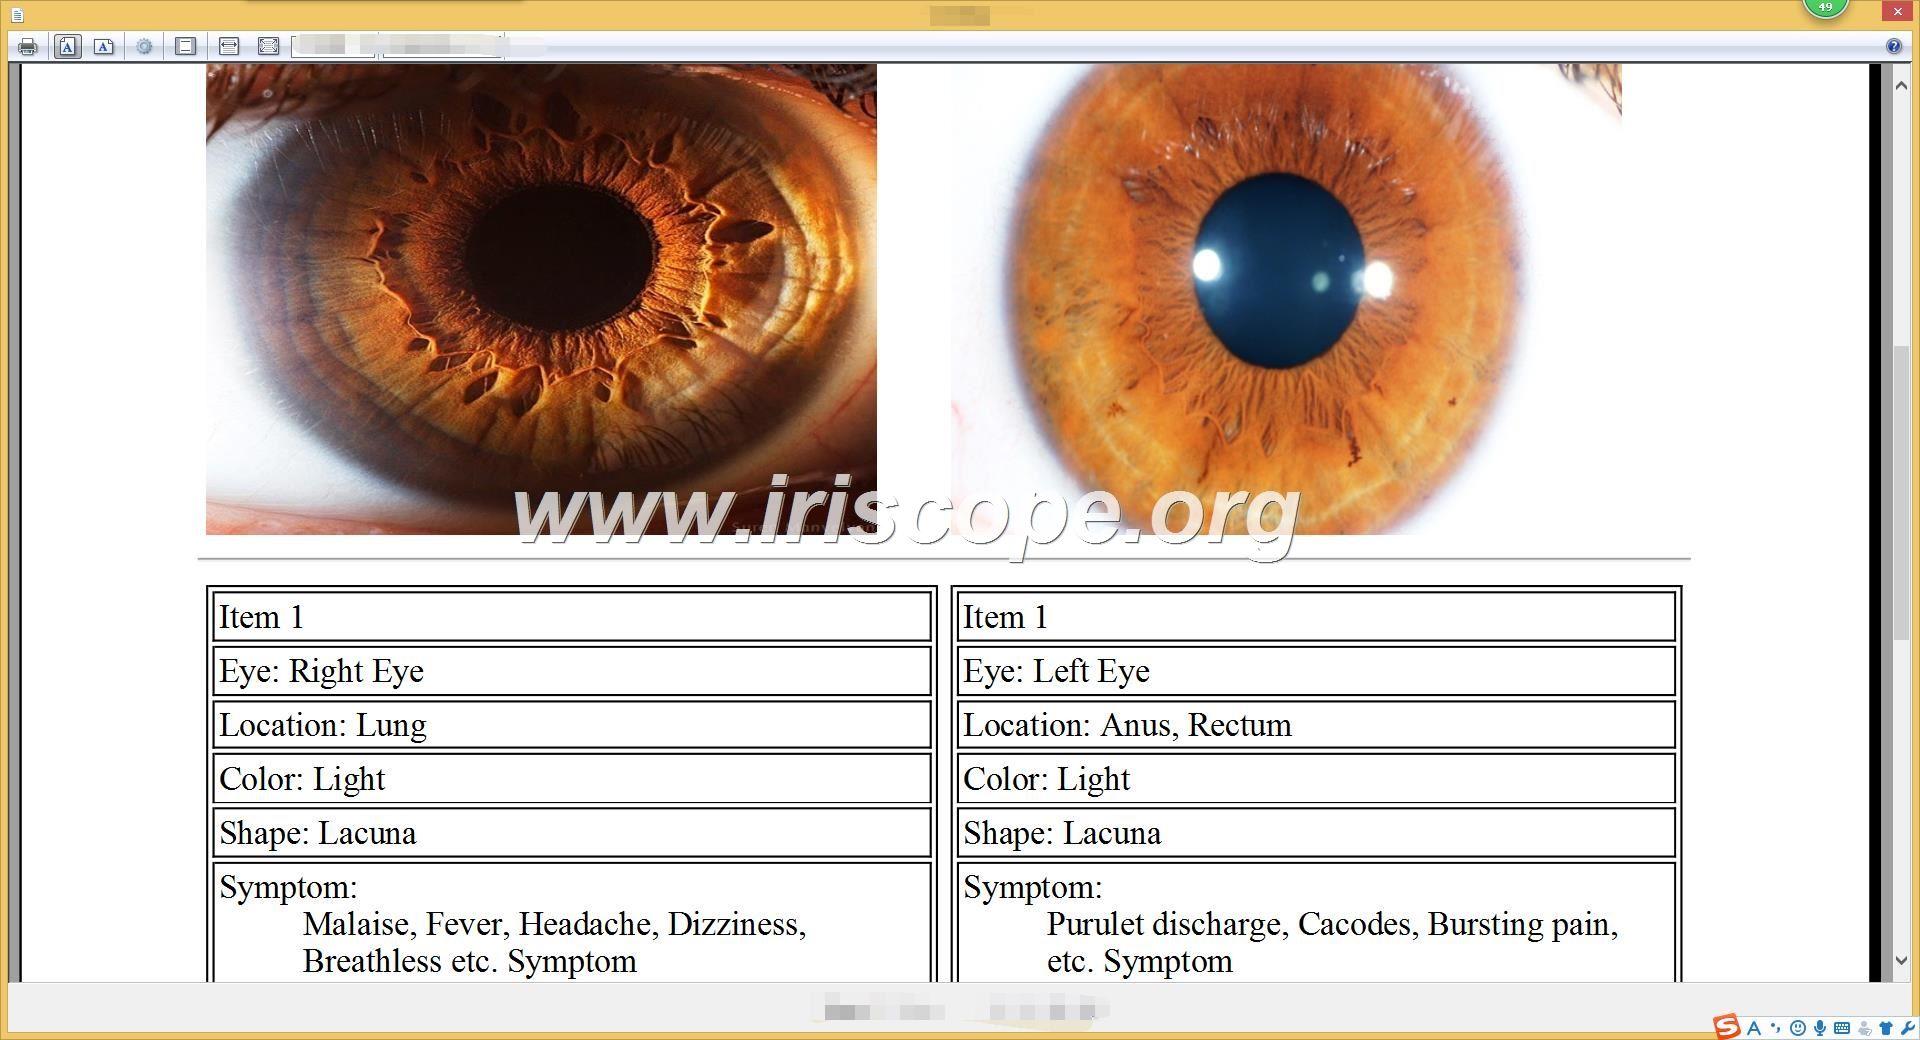 iridology analysis reports